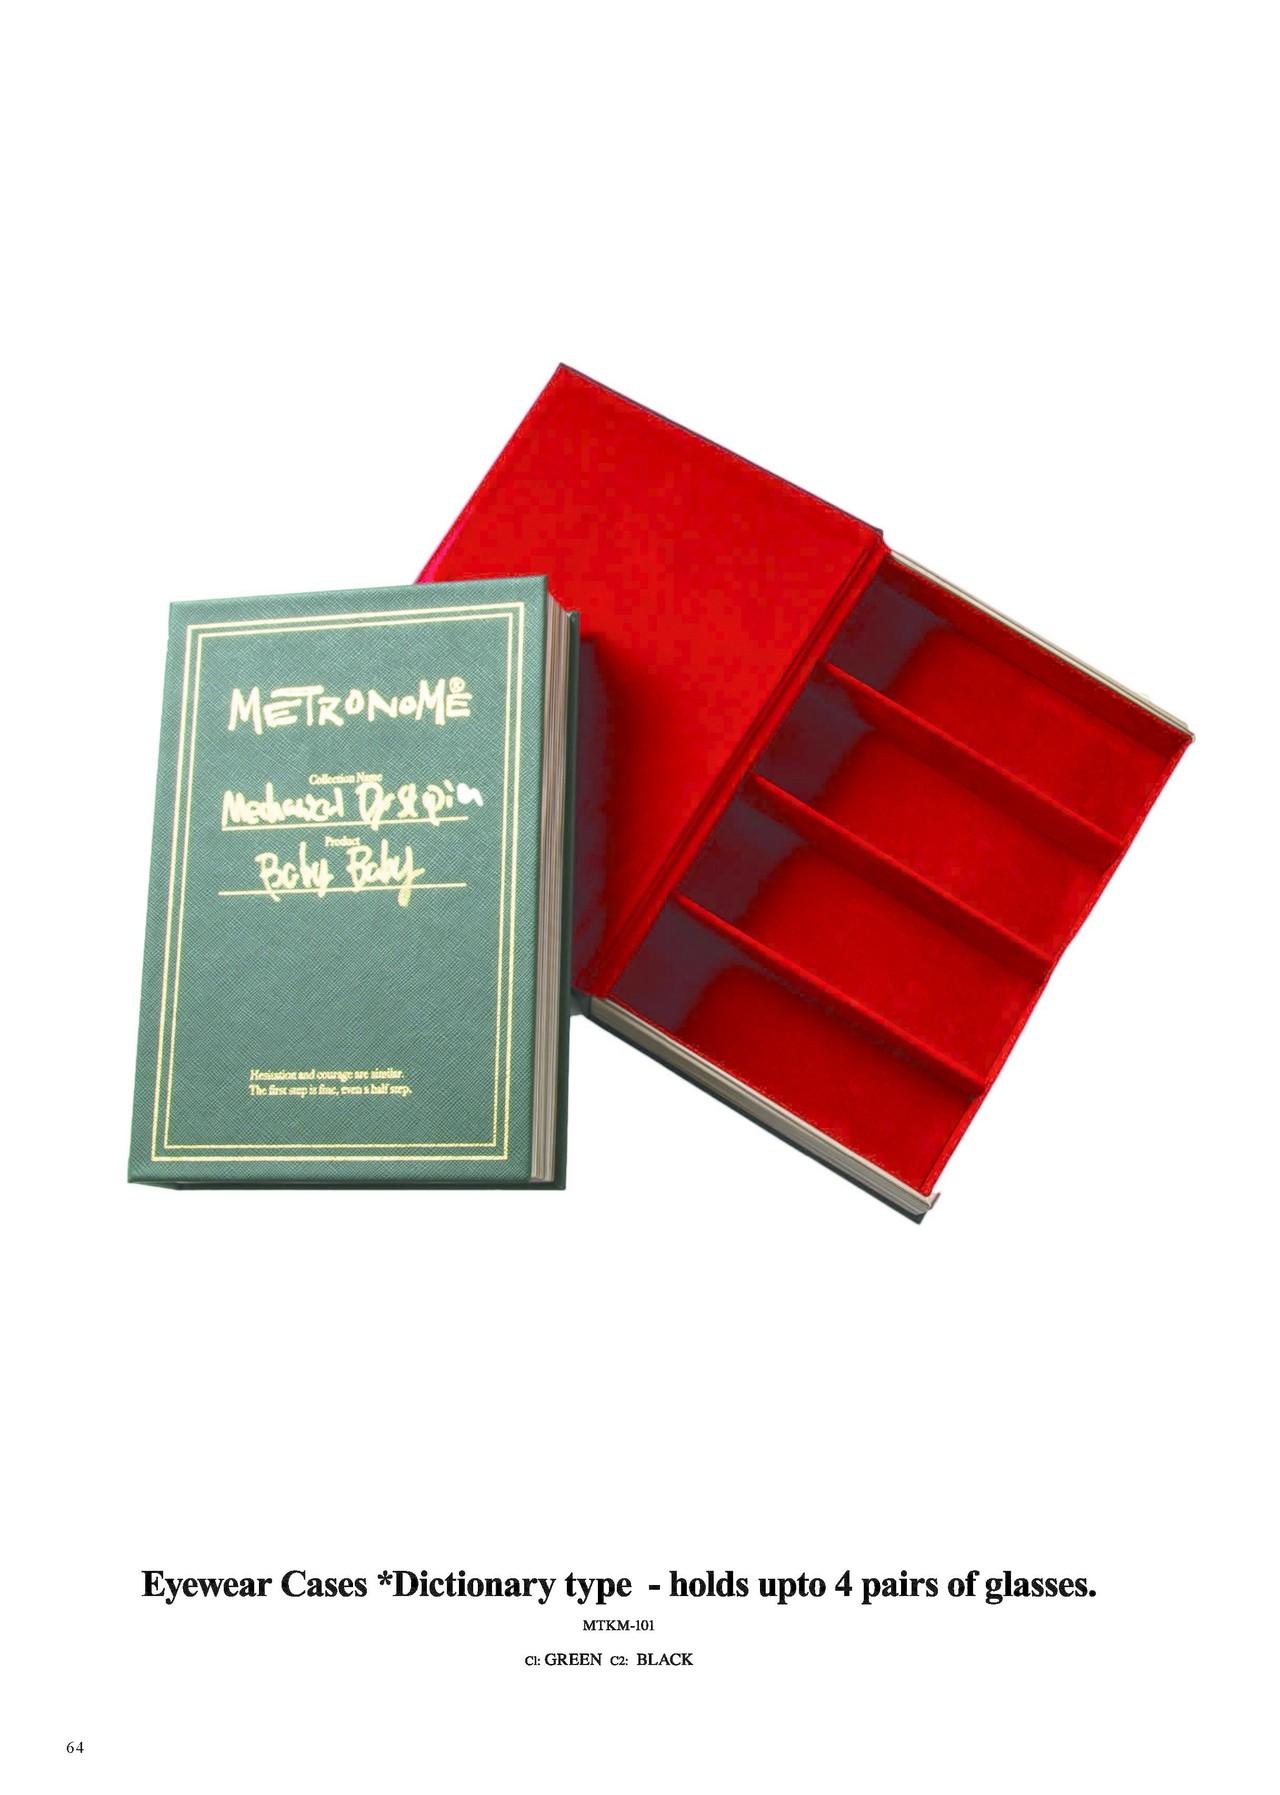 metronome catalog_Quadrophenia_本文2 修正後入稿用_ページ_64